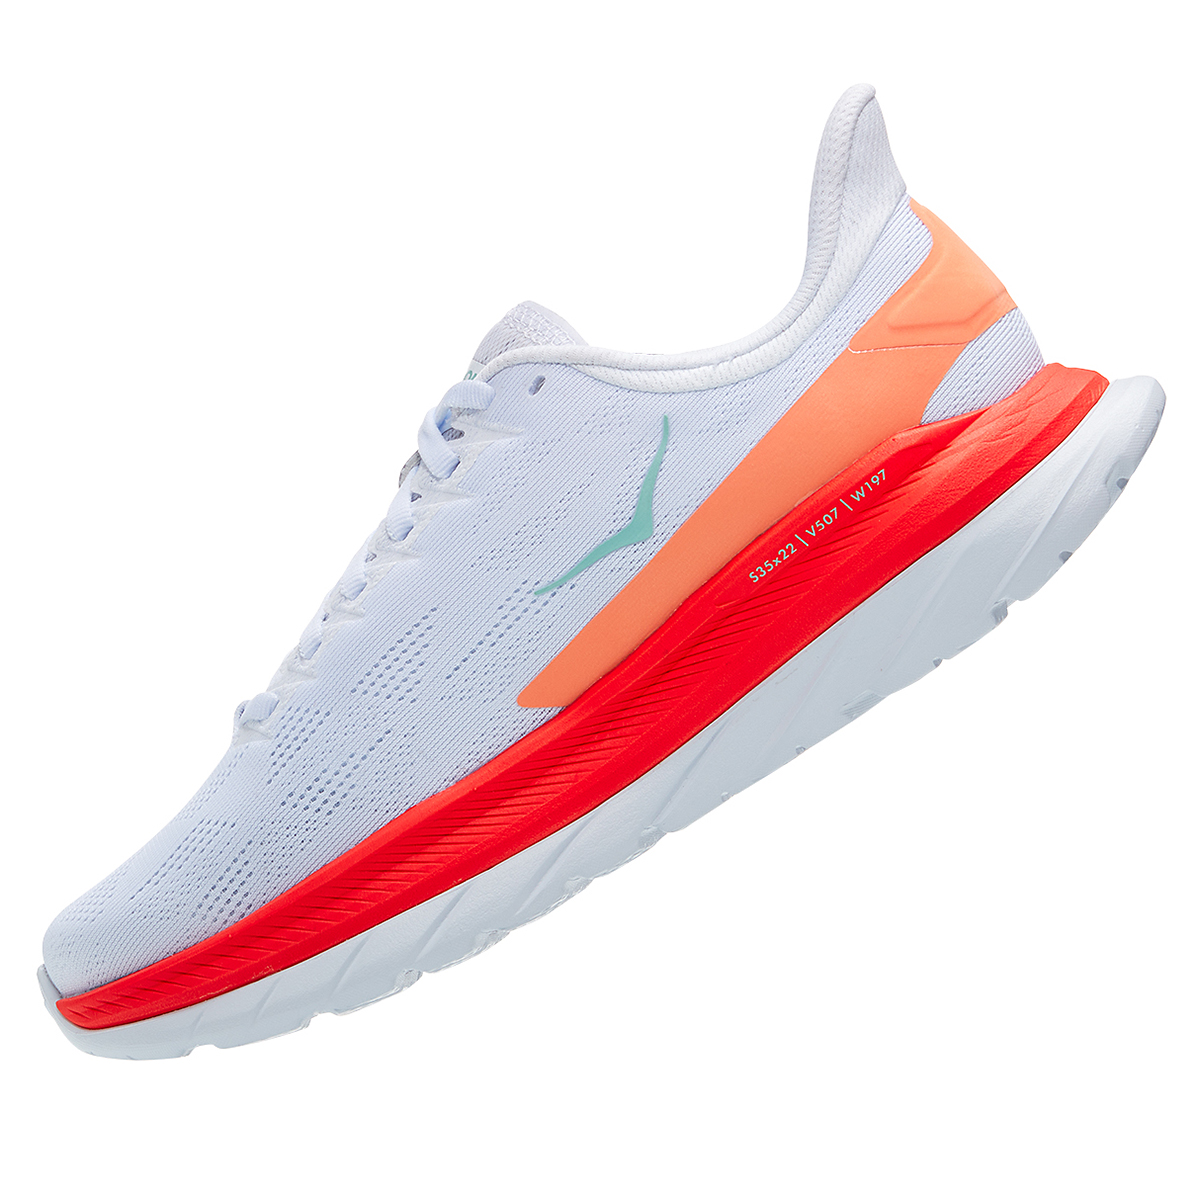 Women's Hoka One One Mach 4 Running Shoe - Color: White/Fiesta - Size: 5 - Width: Regular, White/Fiesta, large, image 4